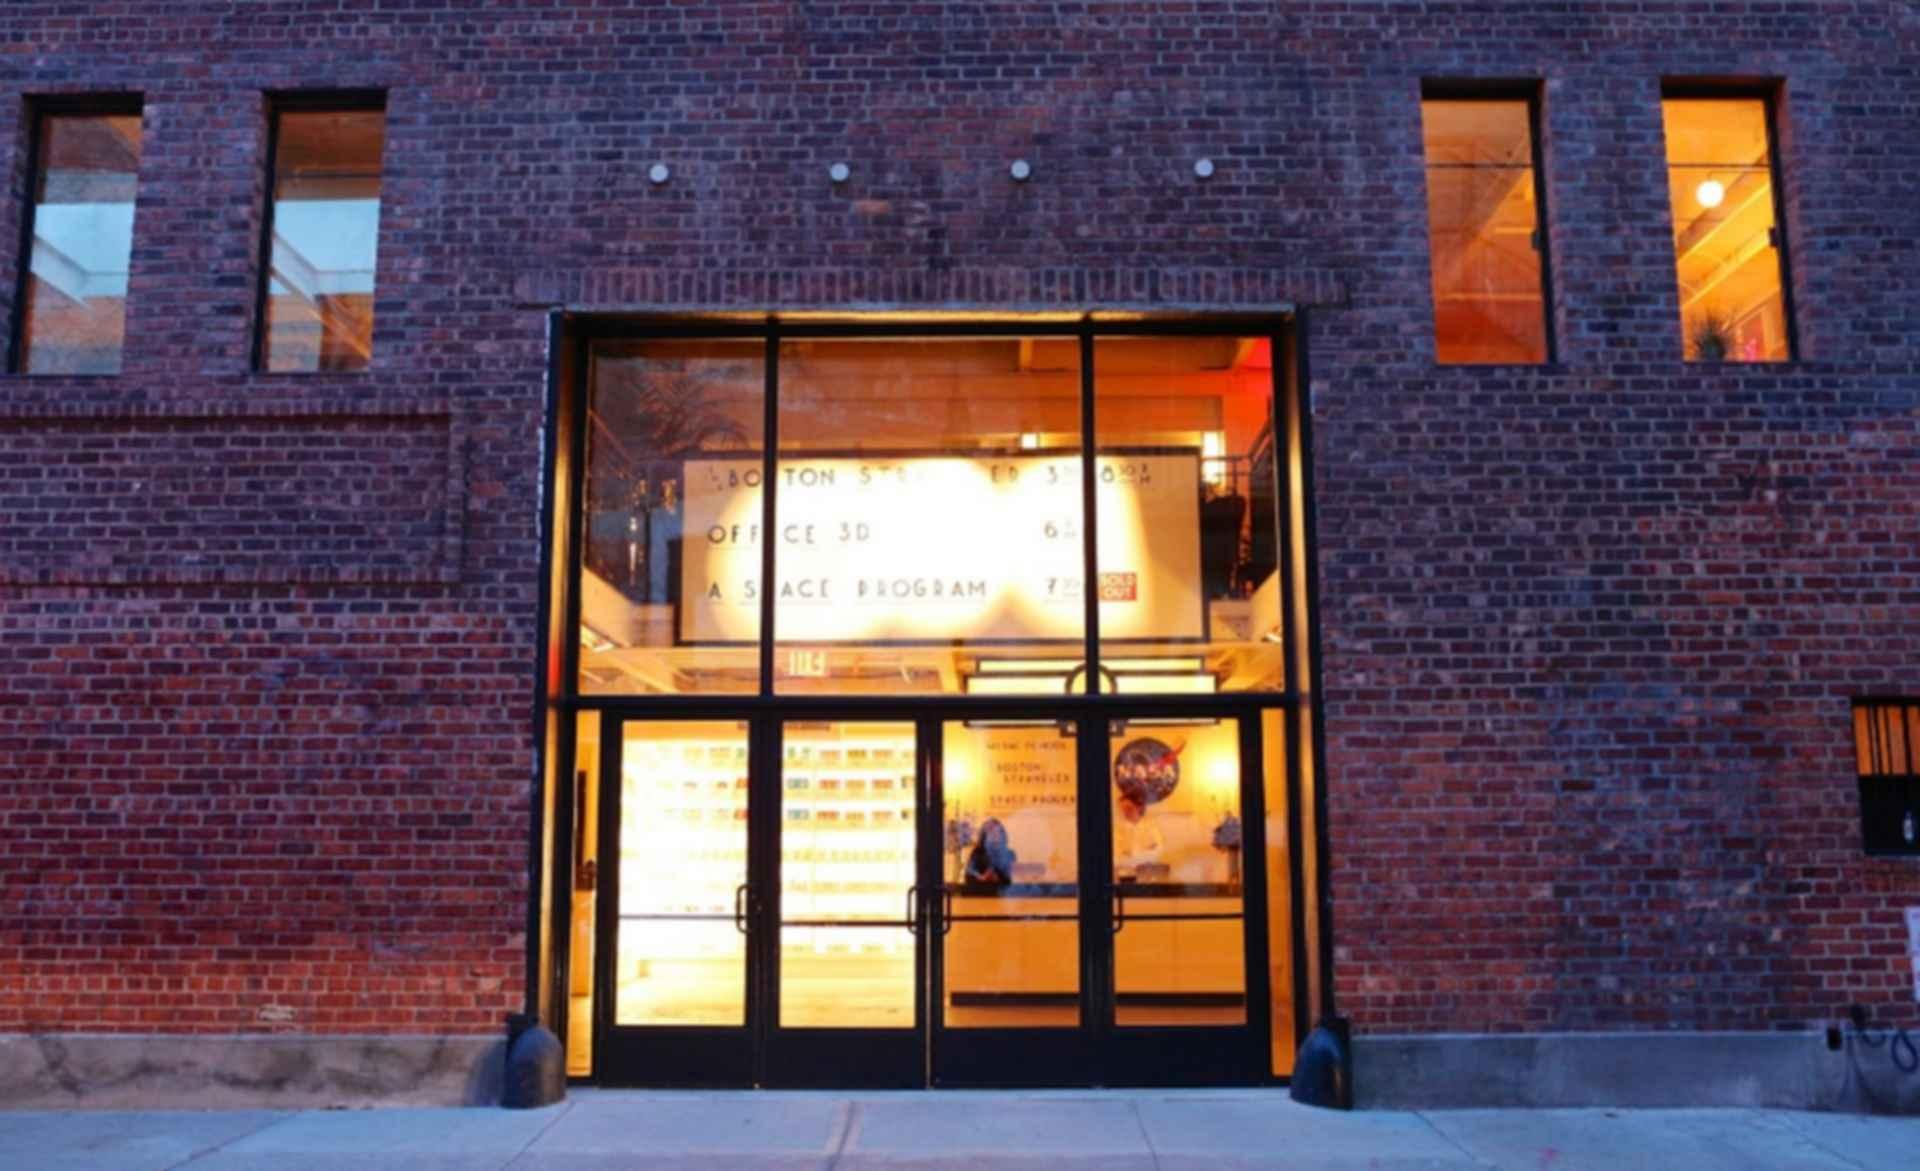 Metrograph Indie Cinema - exterior